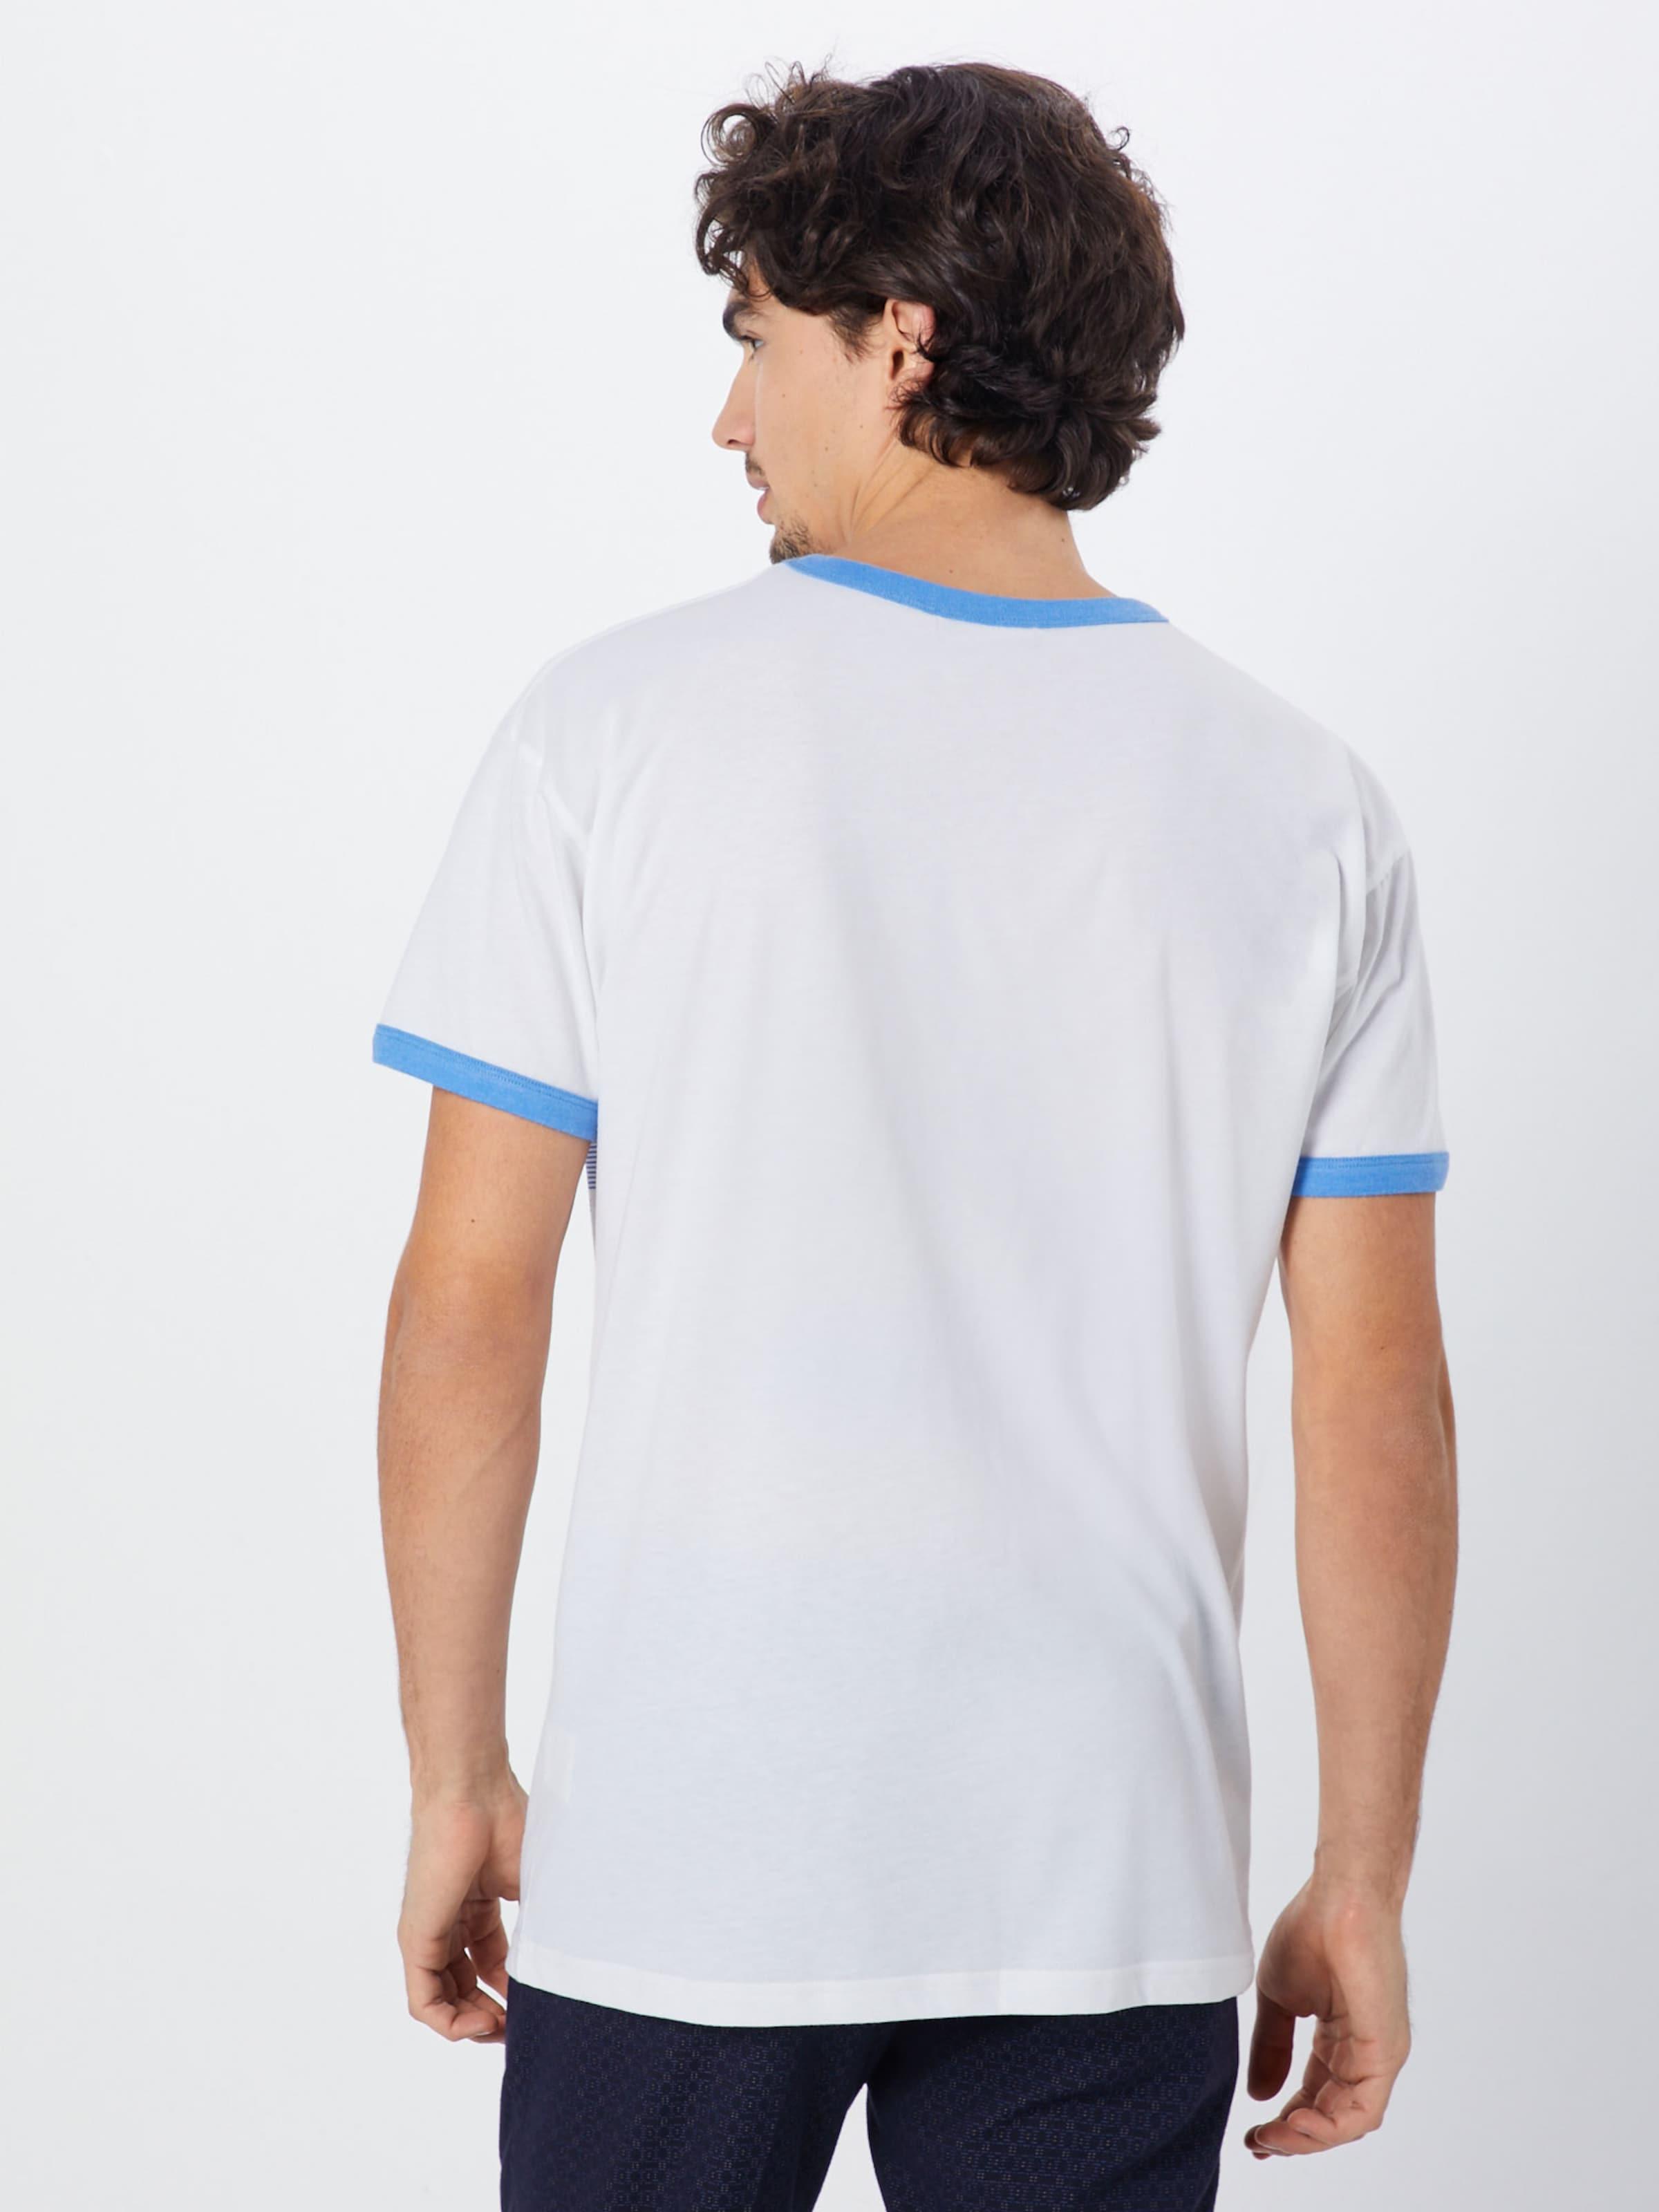 shirt 'kink' T Derbe En BleuBlanc QroedWCBxE